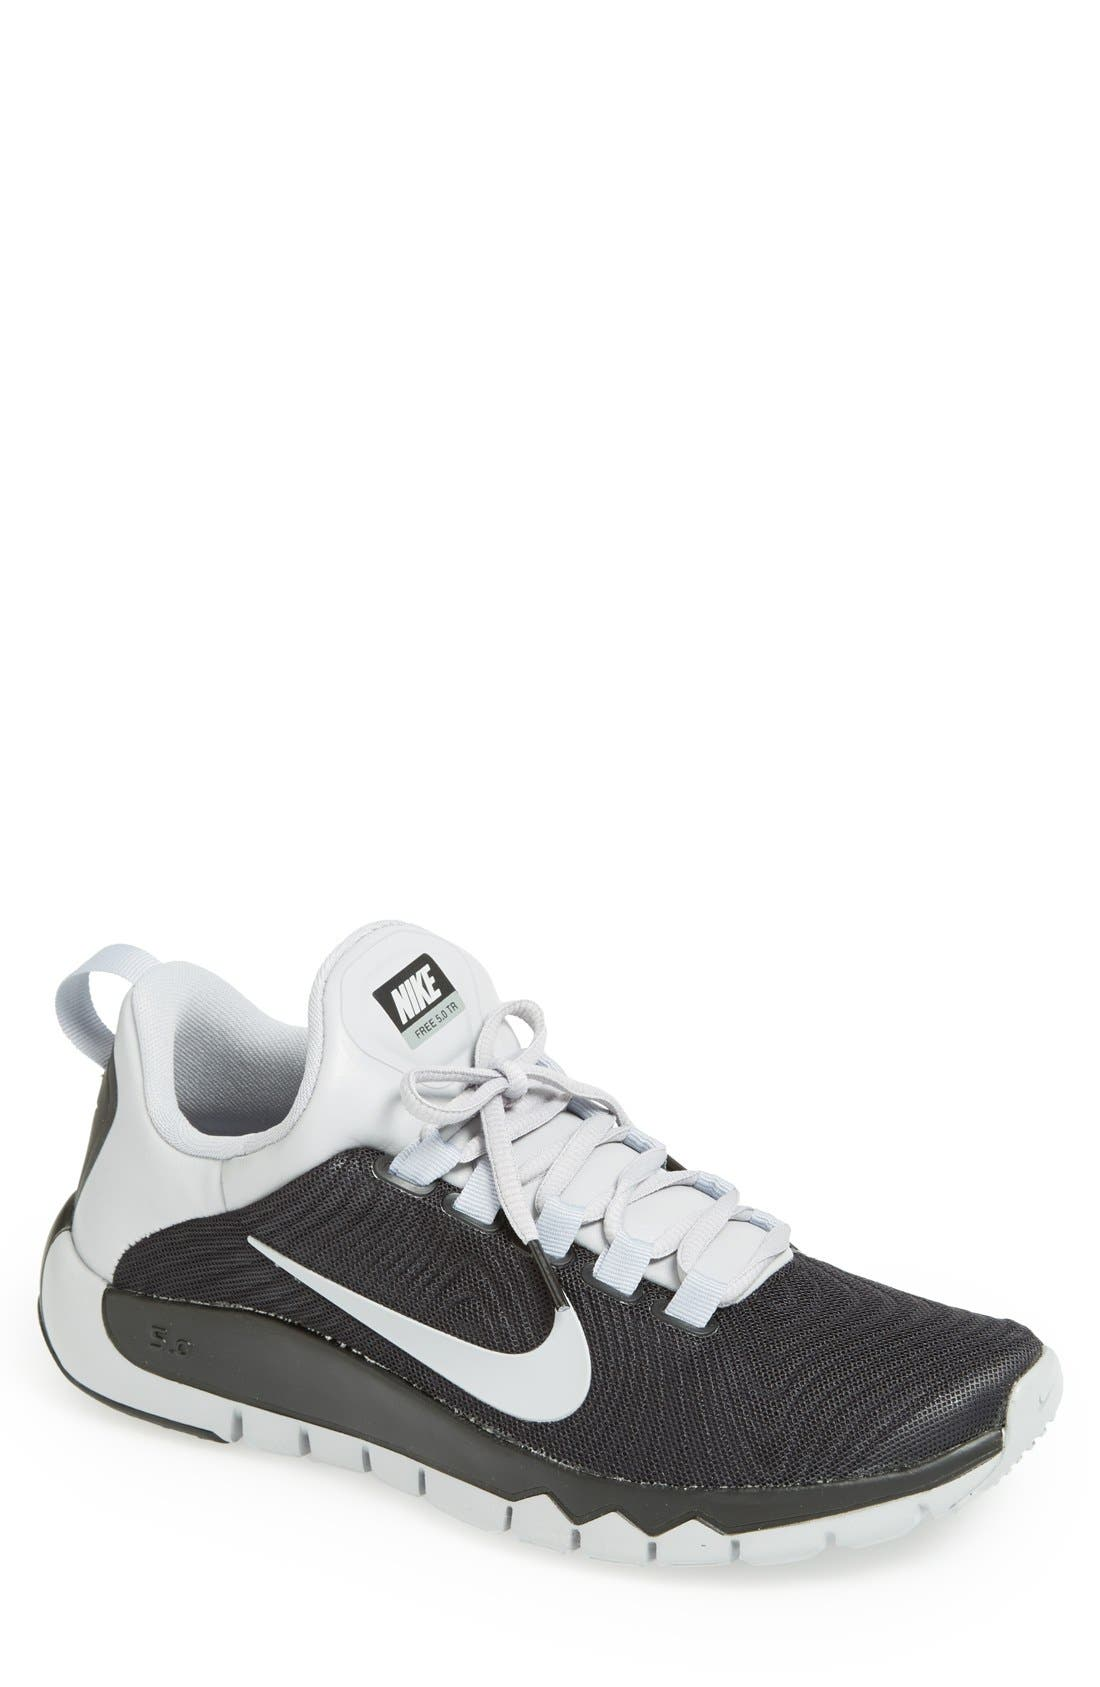 Main Image - Nike 'Free 5.0 Trainer' Training Shoe (Men)